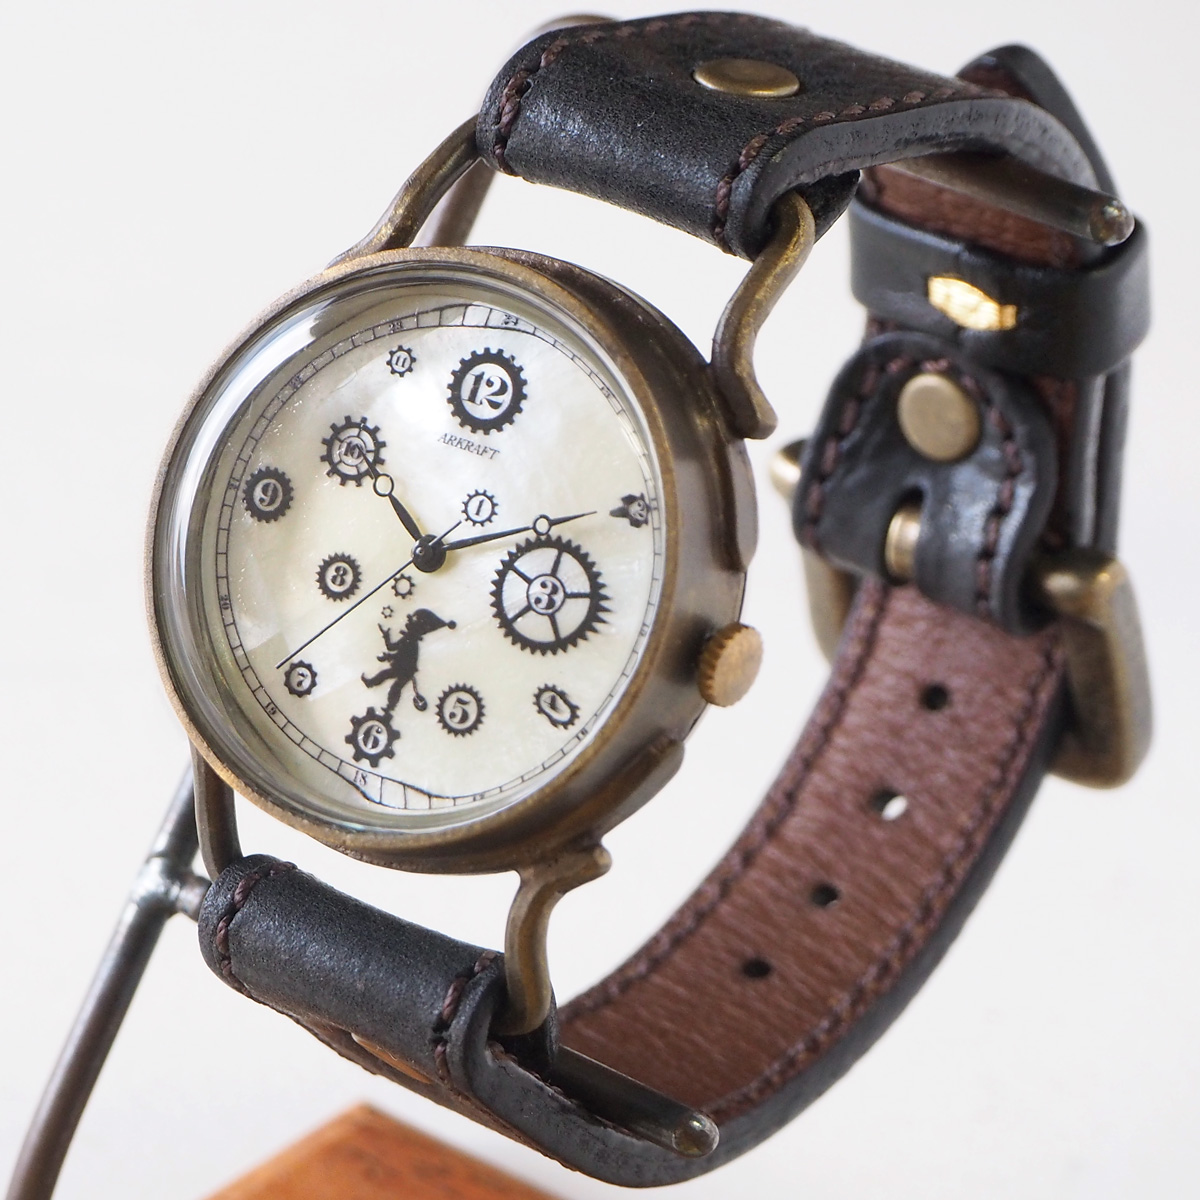 "ARKRAFT(アークラフト)手作り腕時計""Pivo Large"" プレミアムストラップ [AR-C-014-WH] 時計作家 新木秀和 ハンドメイドウォッチ ハンドメイド腕時計 手作り時計 本革ベルト シェル文字盤 歯車 真鍮 クオーツ アナログ 日本製 国産"